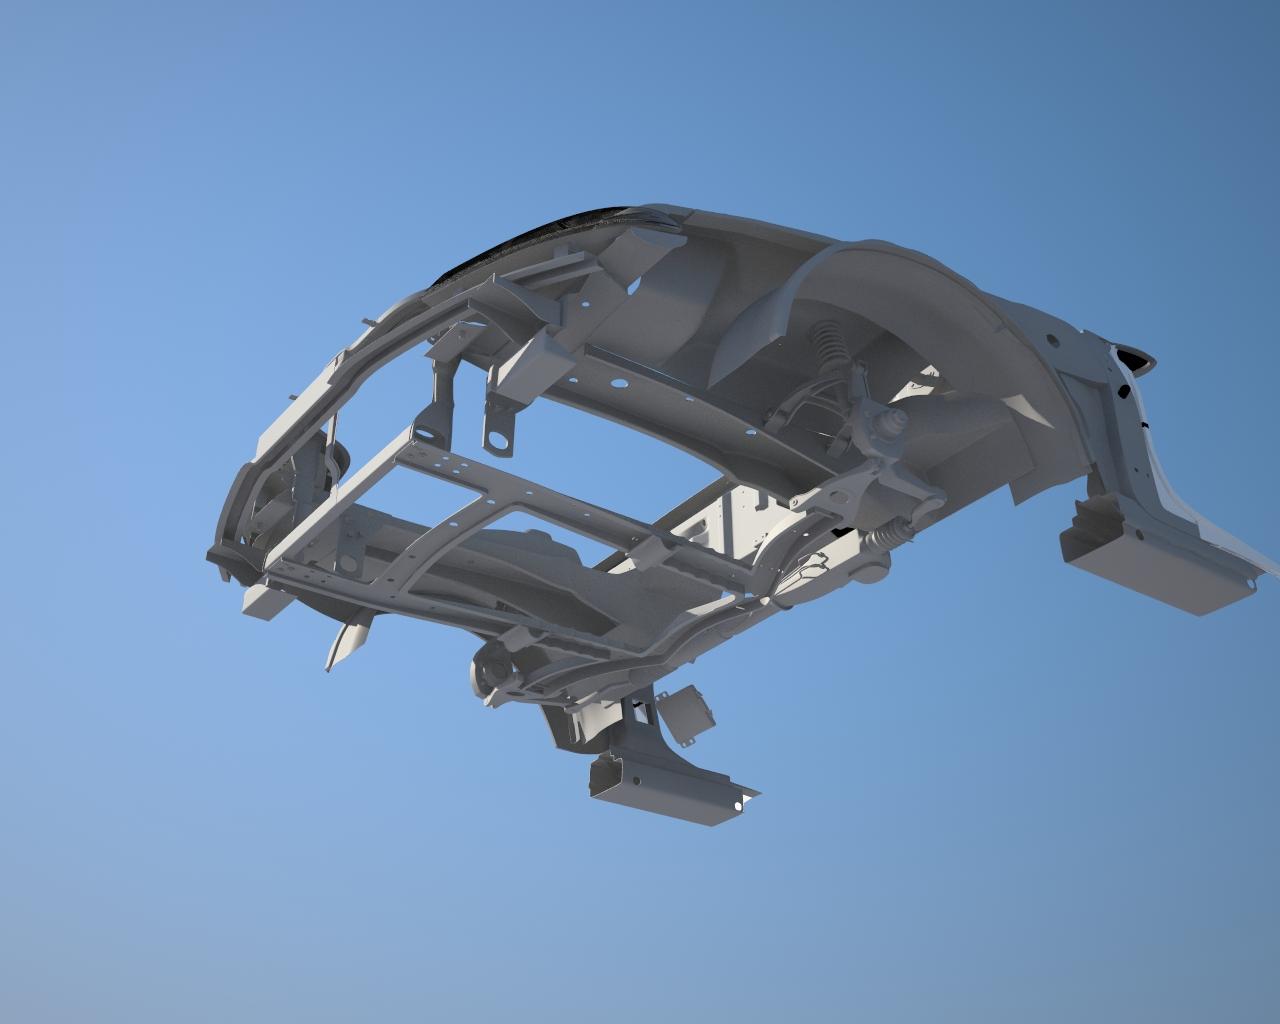 Honda Prelude Thurston in 3d max vray 3.0 image